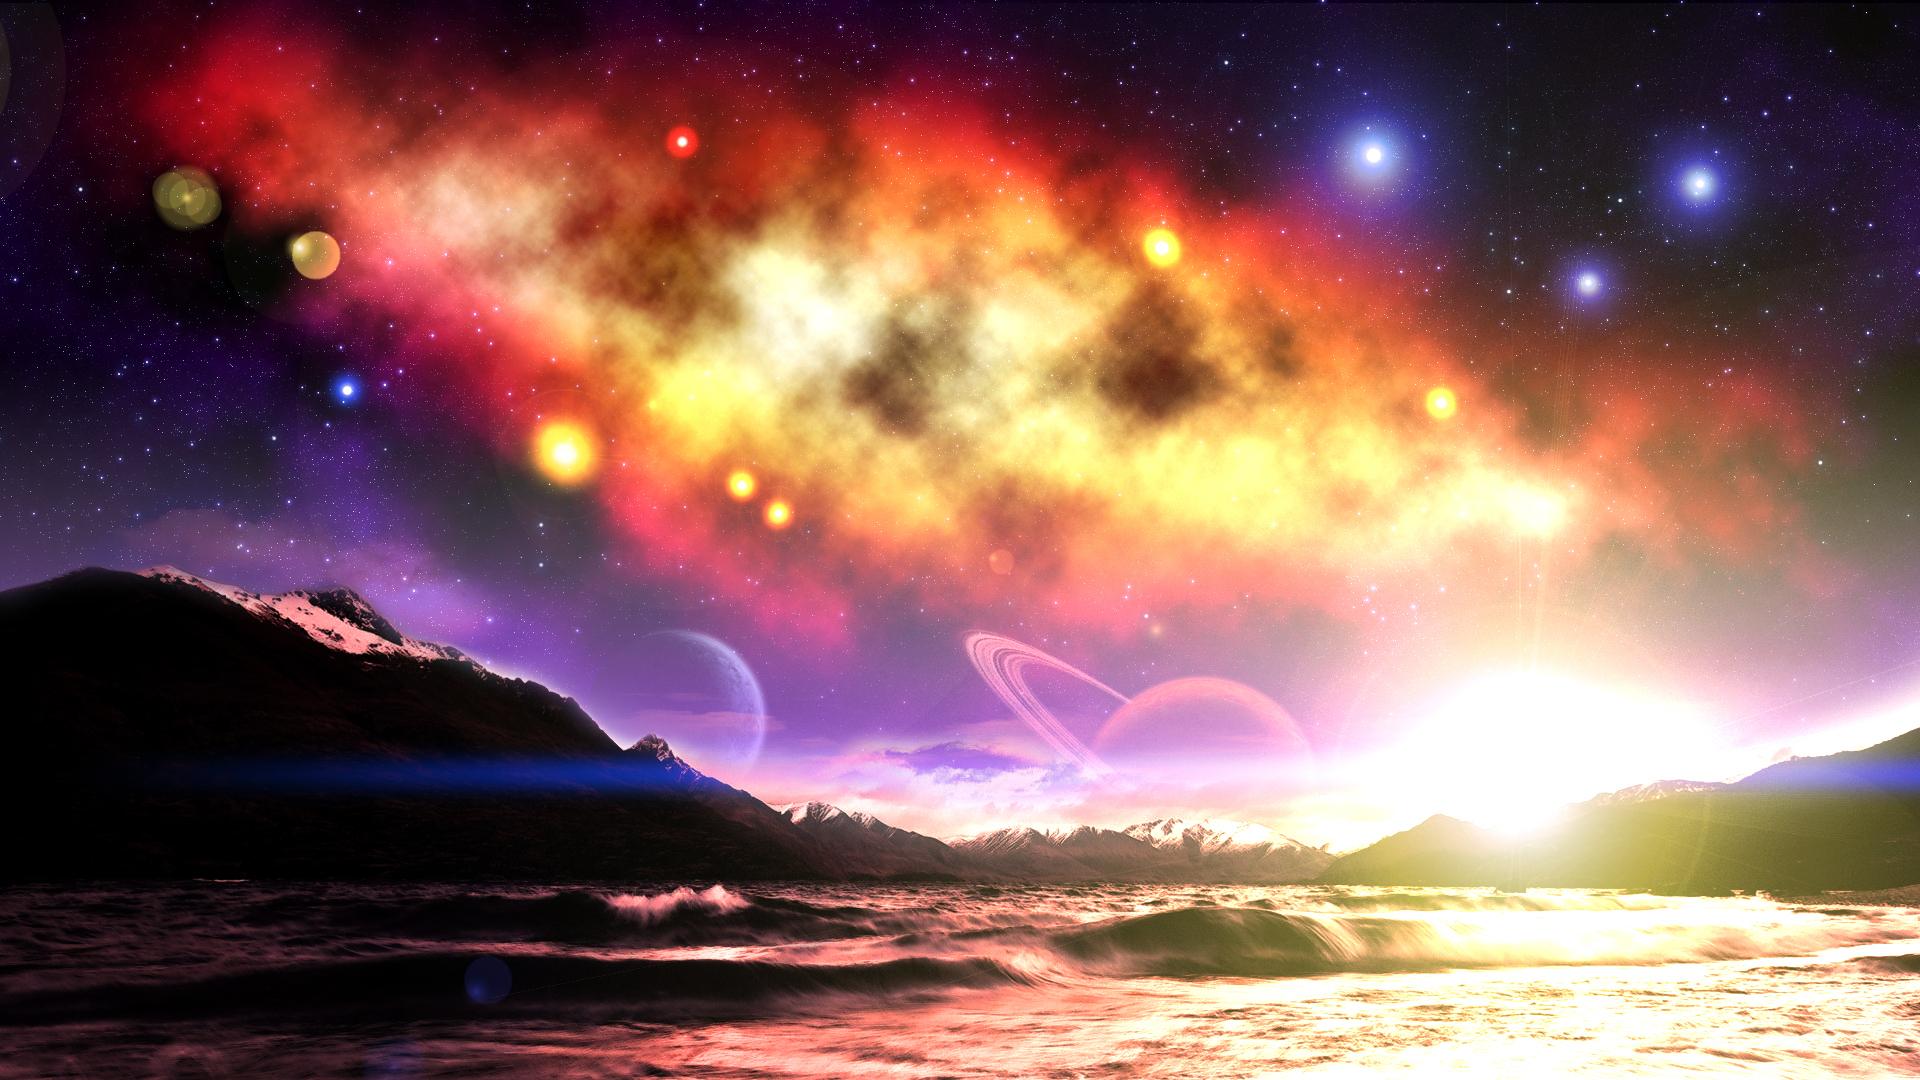 planets nature 1920x1080 - photo #13